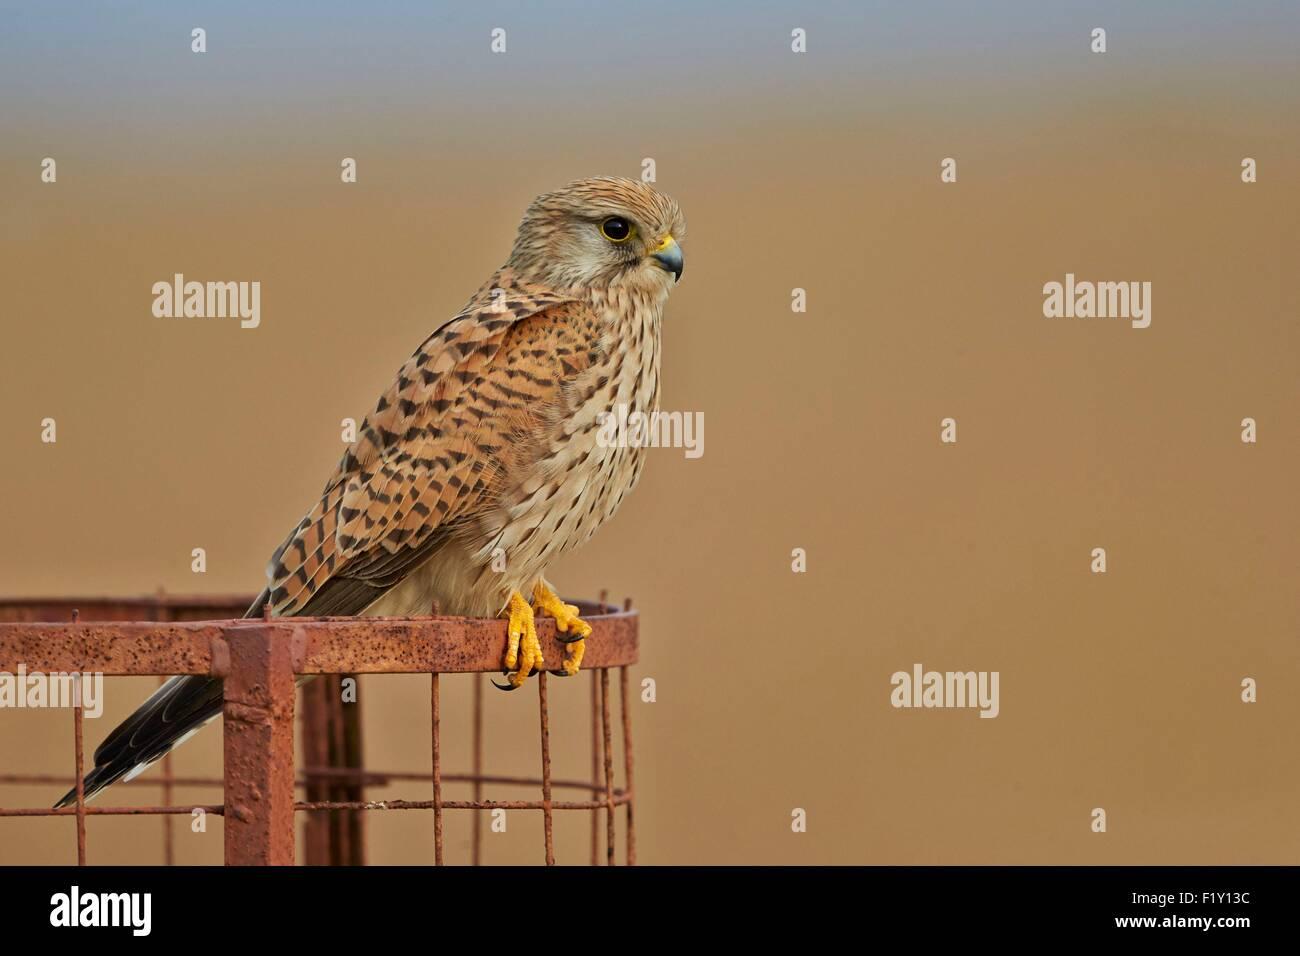 India, Gujarat state, Blackbuck national park, Common kestrel (Falco tinnunculus), also known as the European kestrel, - Stock Image